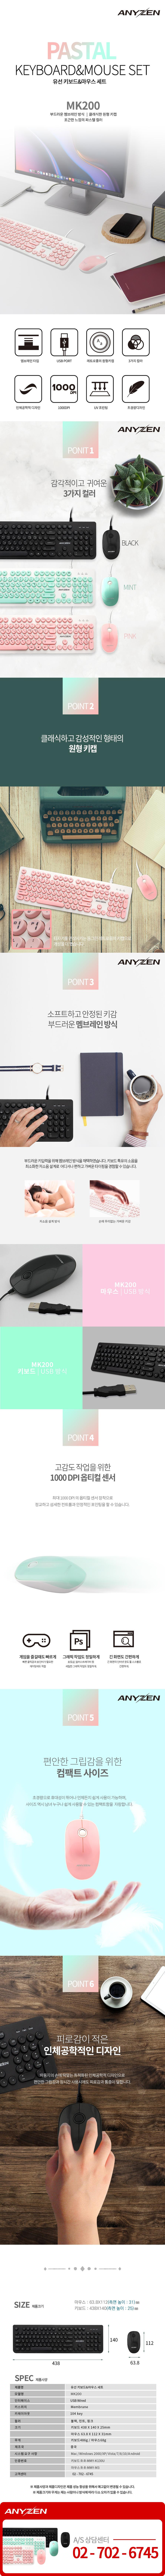 ANYZEN  MK200 유선 키보드 마우스 세트(핑크)